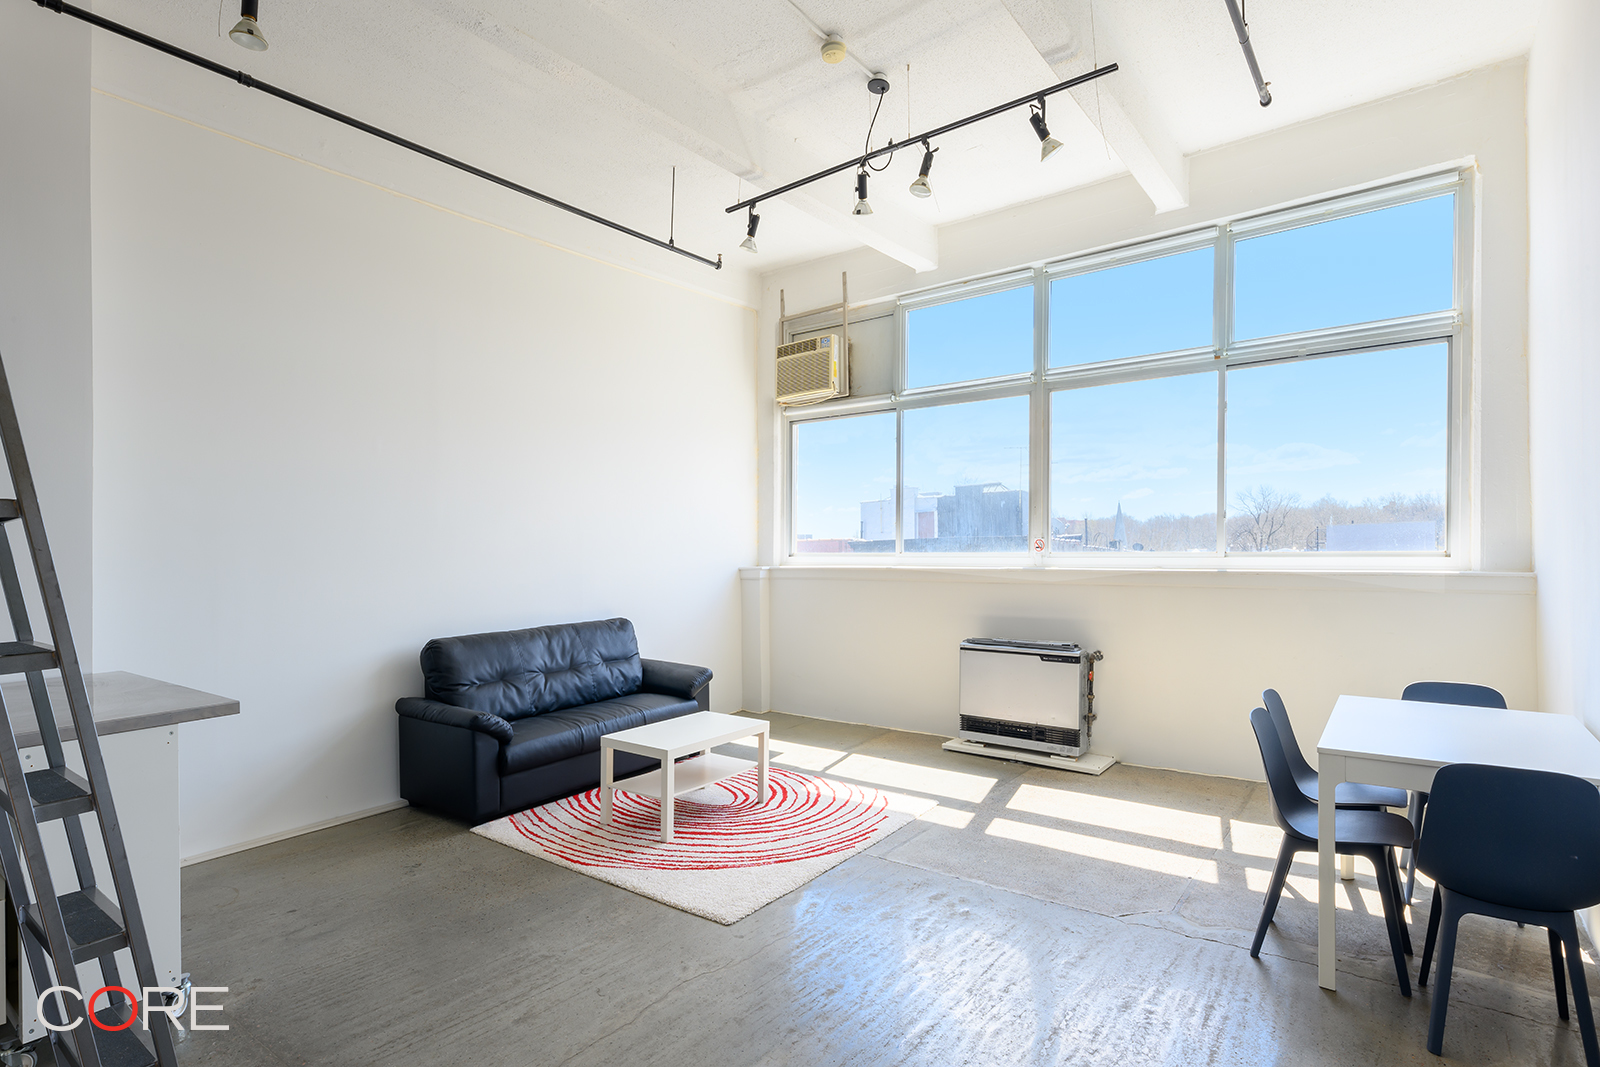 231 Norman Avenue, Apt 402, Brooklyn, New York 11222